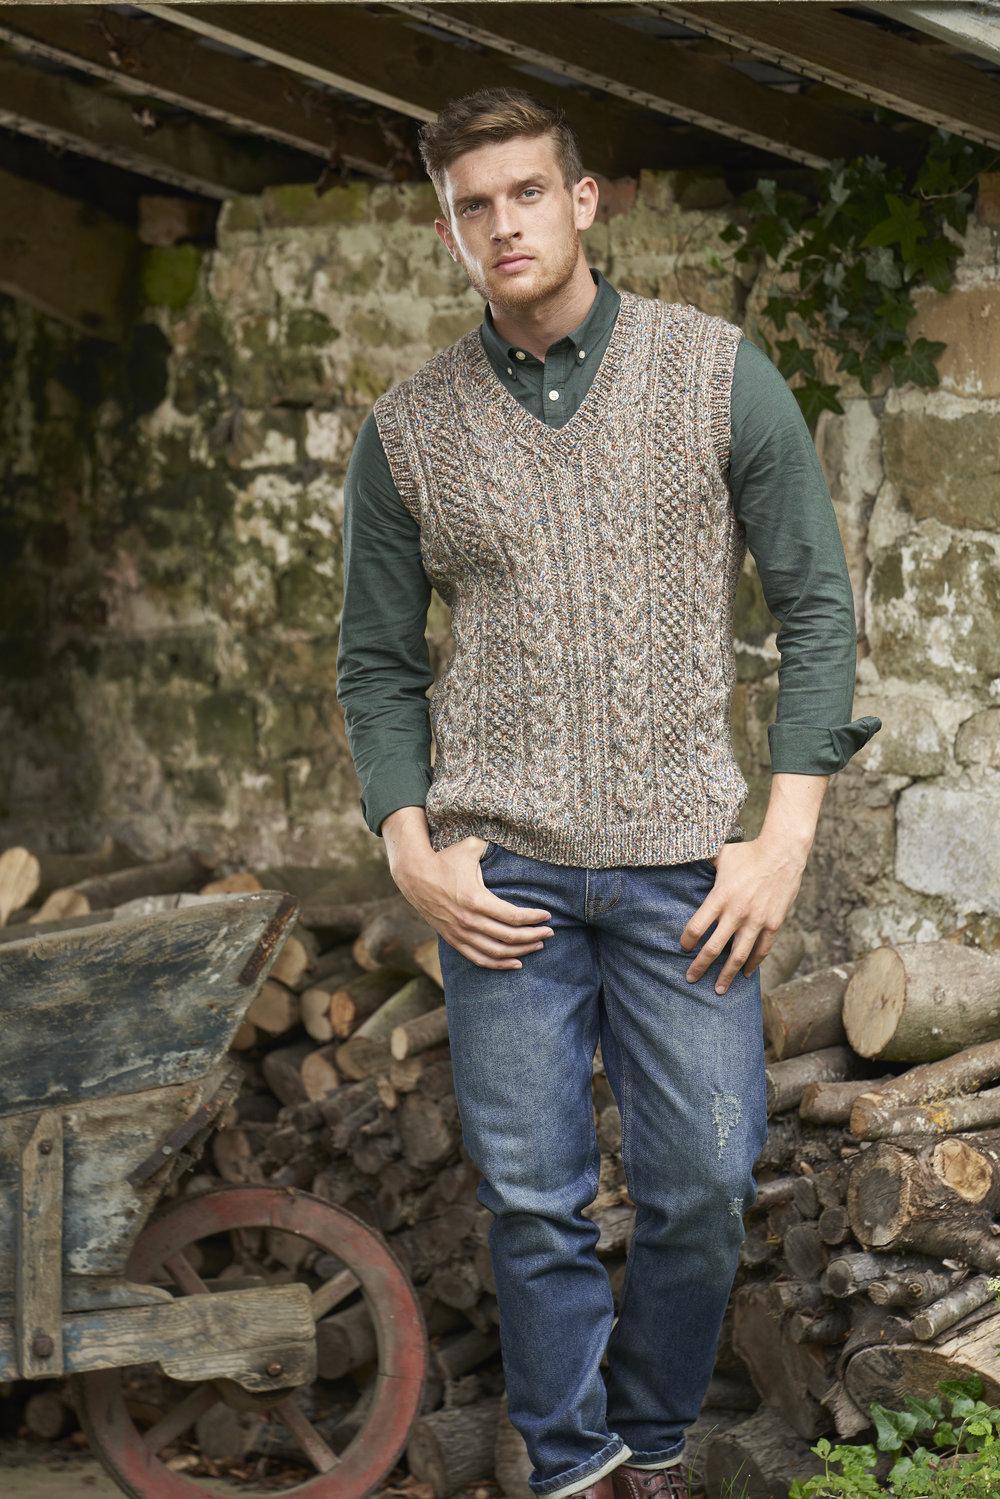 knitter070618jw_3595.jpg